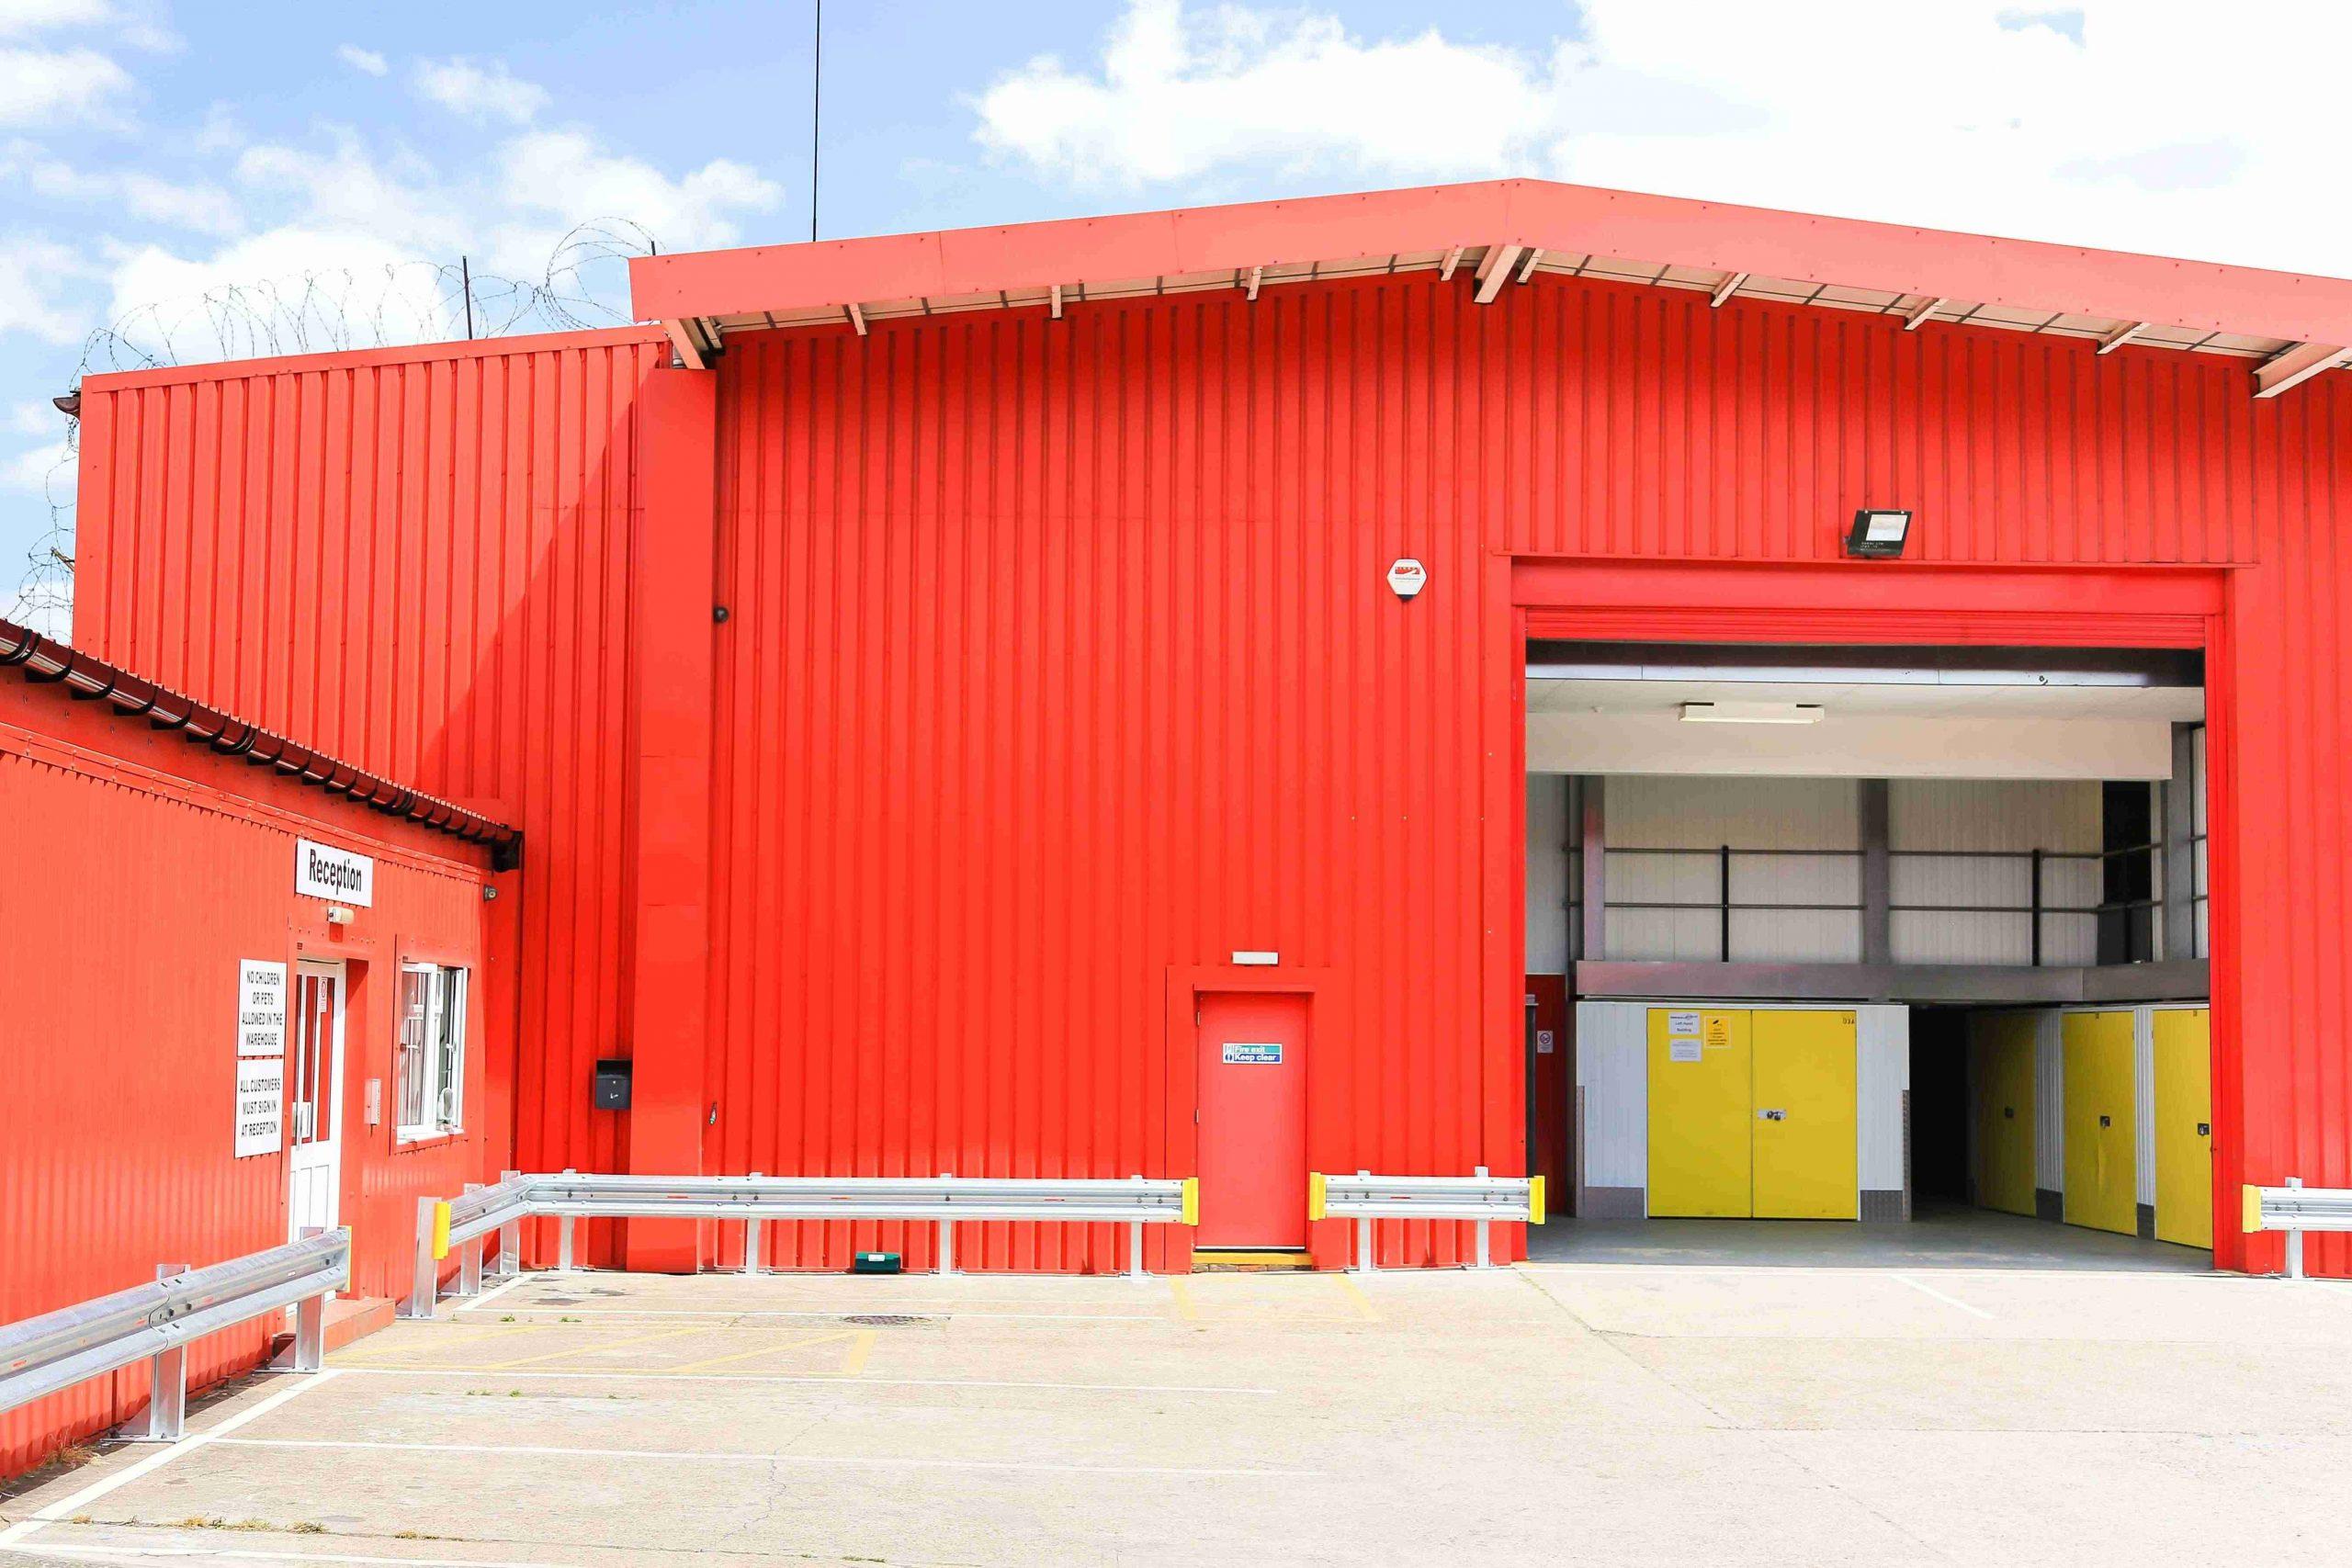 Henfield Storage - Southwark a storage company in Record Street, London, UK